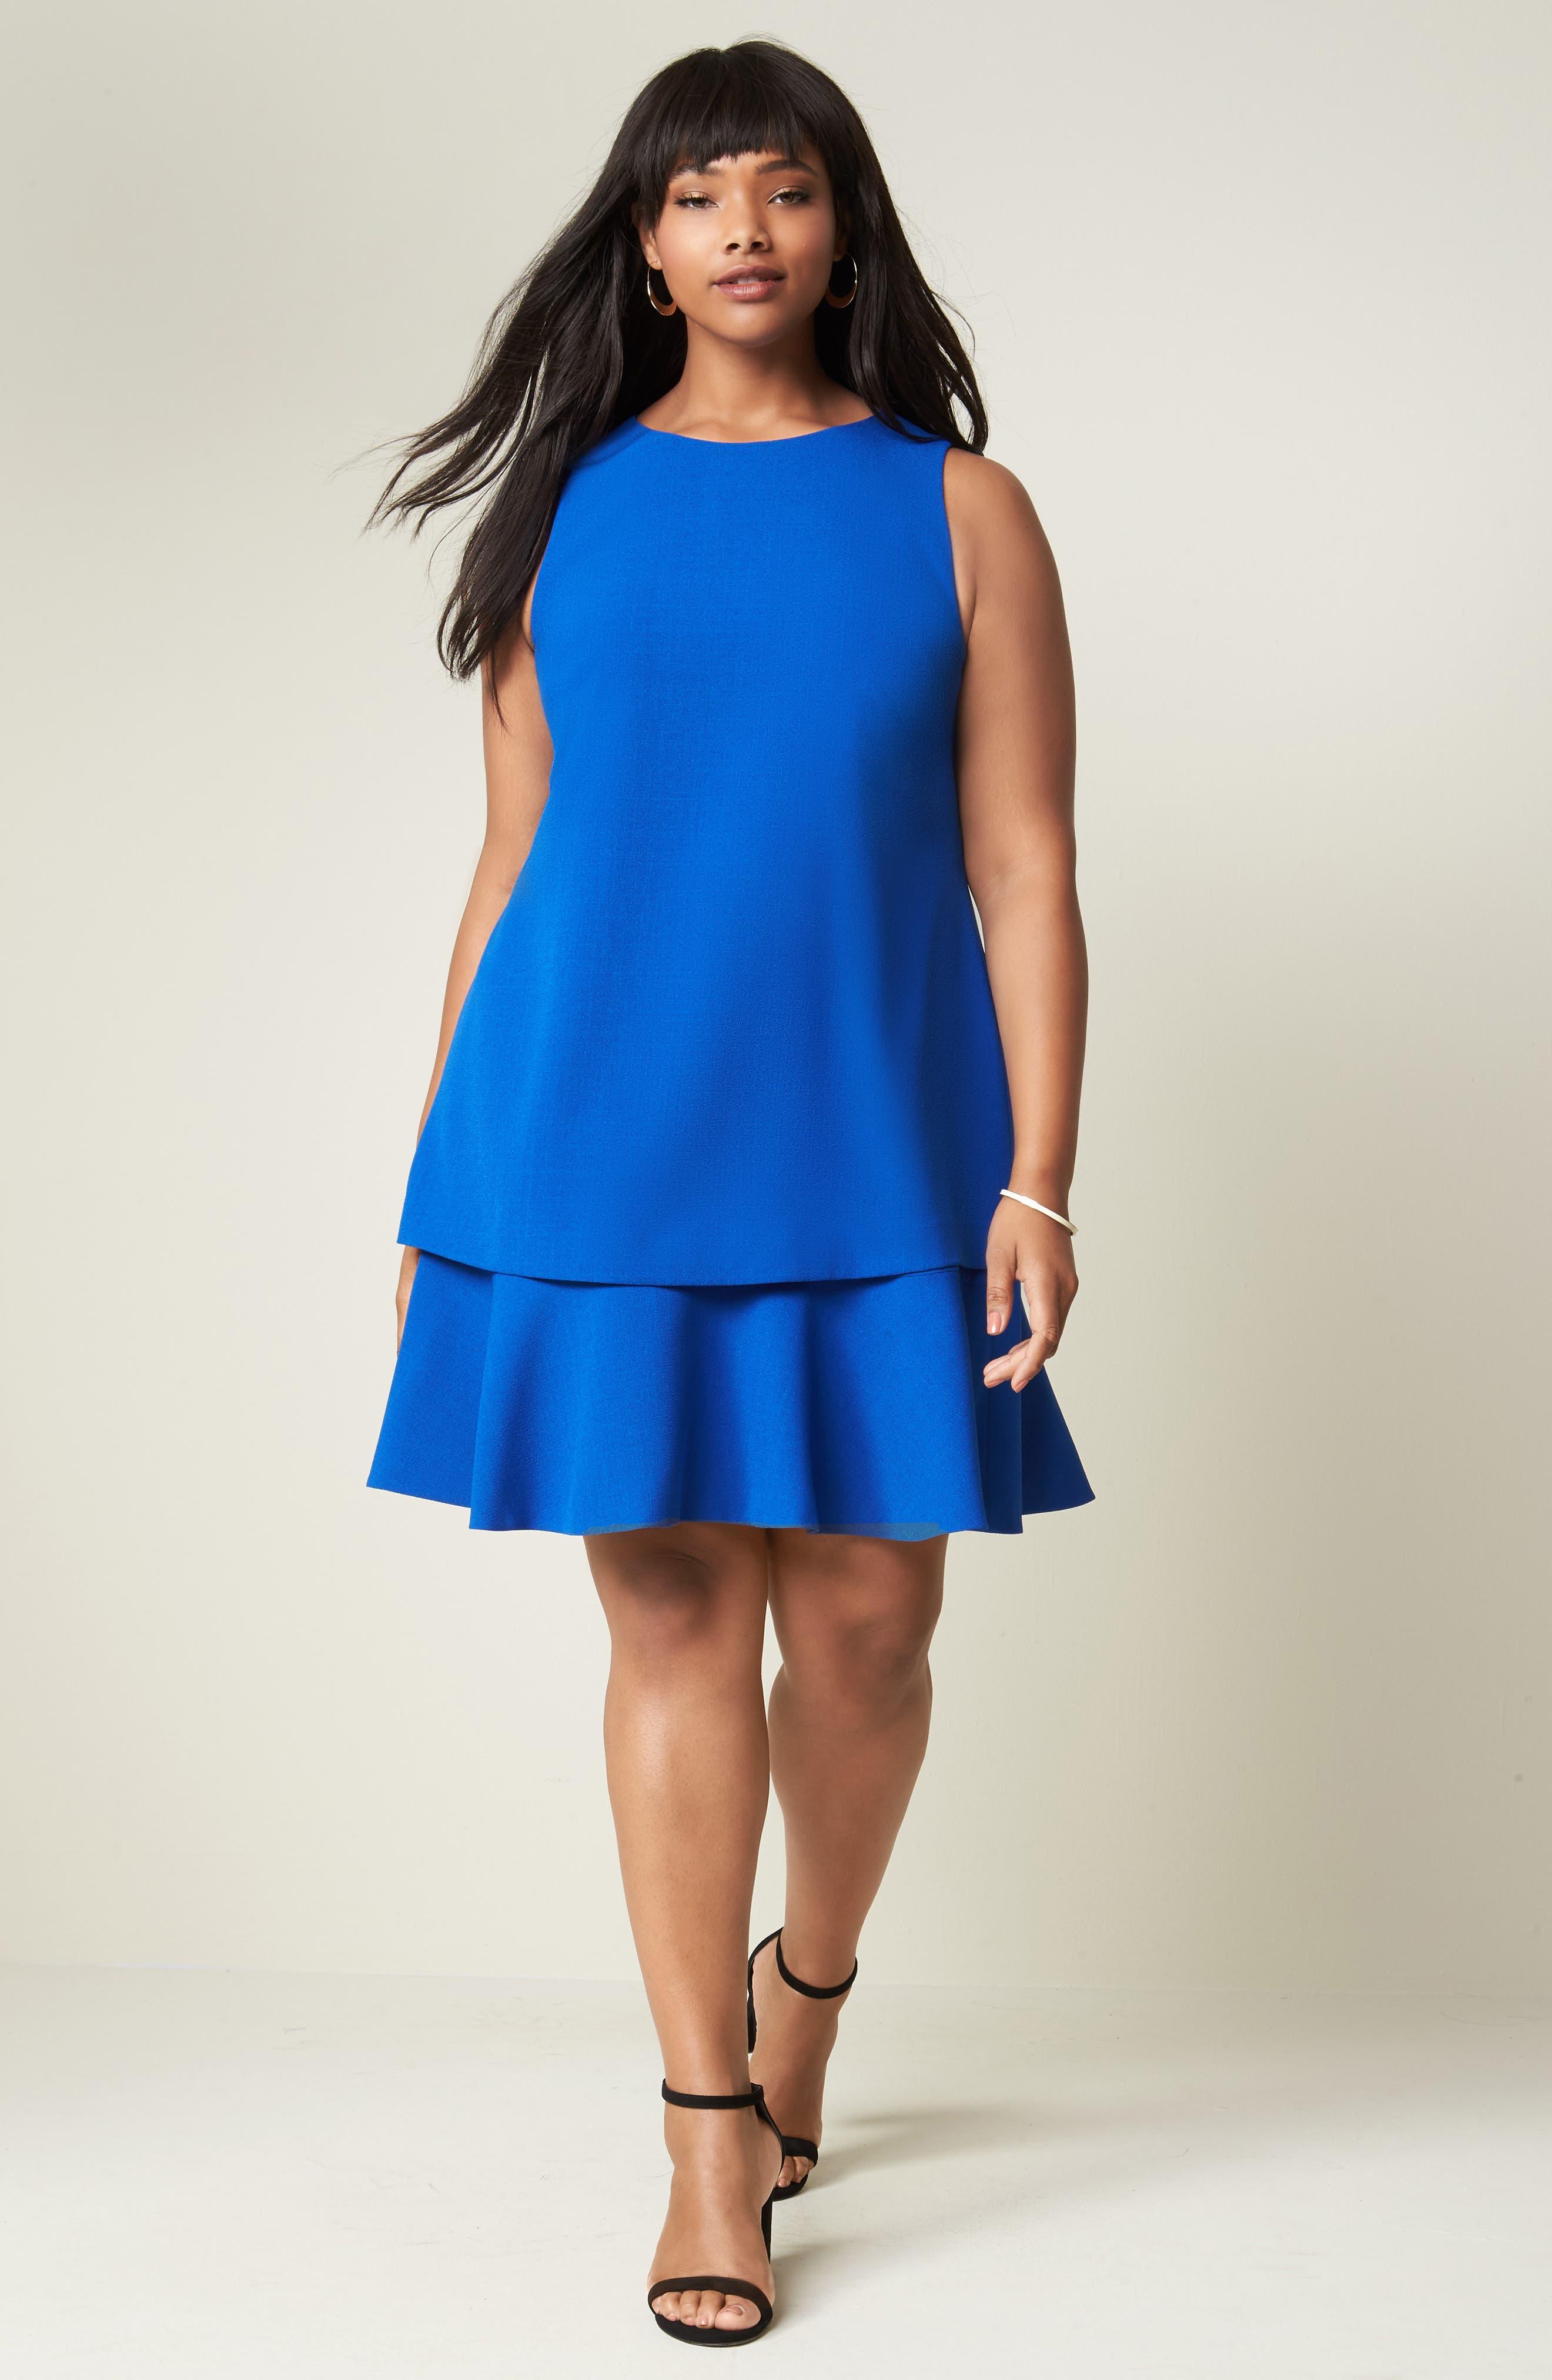 Tiered Drop Waist A-Line Dress,                             Alternate thumbnail 7, color,                             432